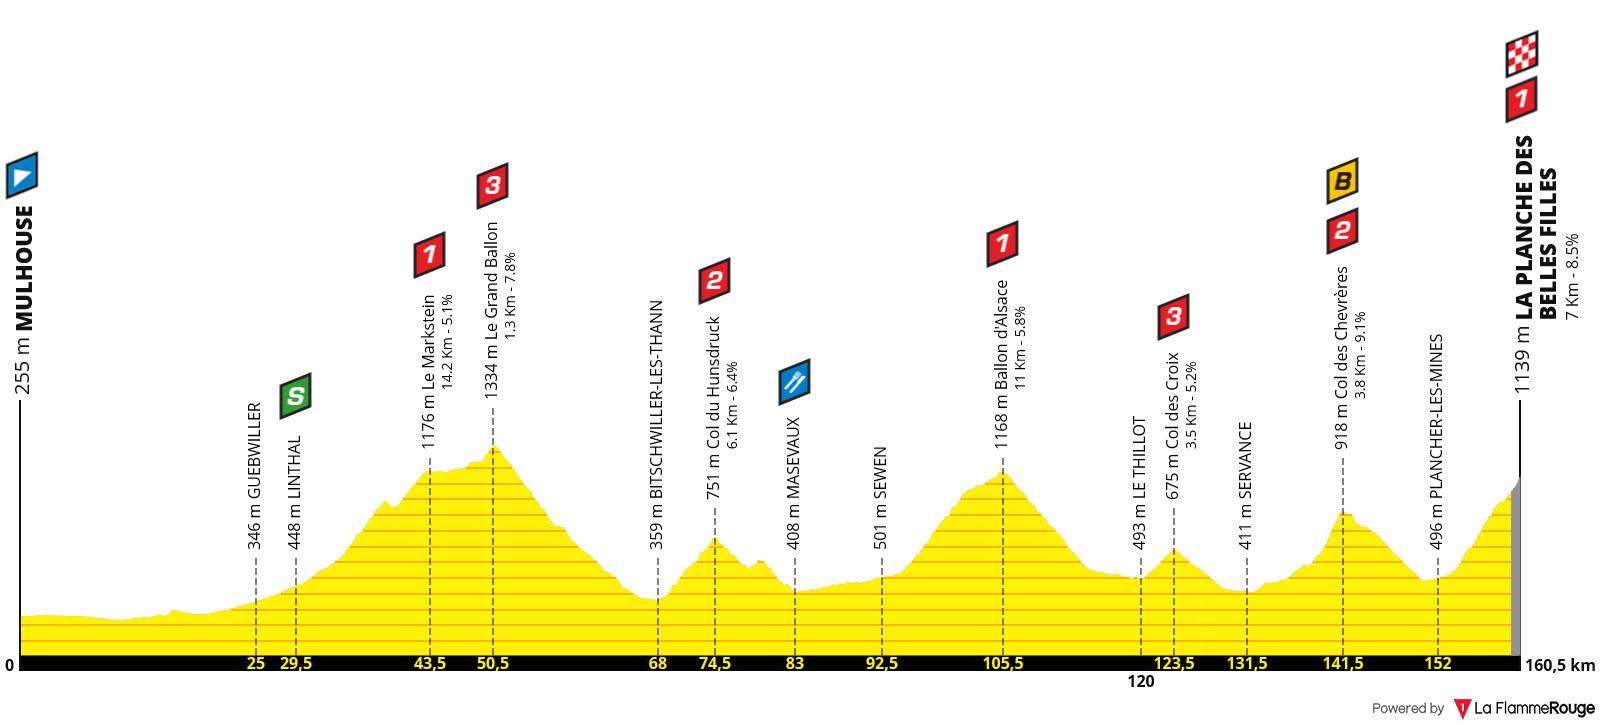 Perfil Etapa 06 - Tour de Francia 2019